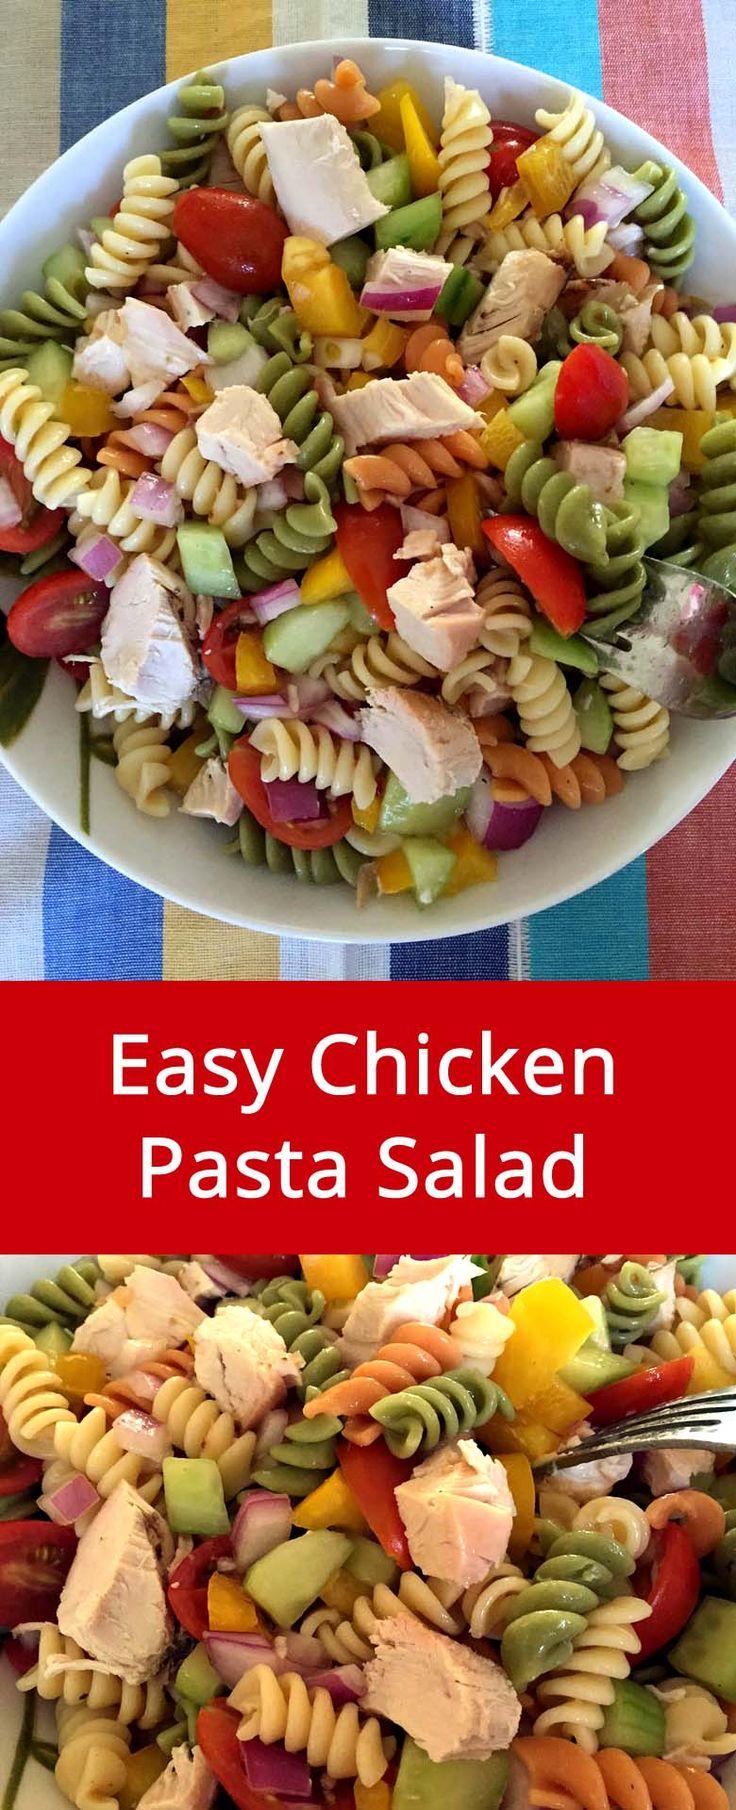 Chicken Pasta Salad Recipe - Awesome Main Dish Pasta Salad, Makes Complete Dinner! | MelanieCooks.com